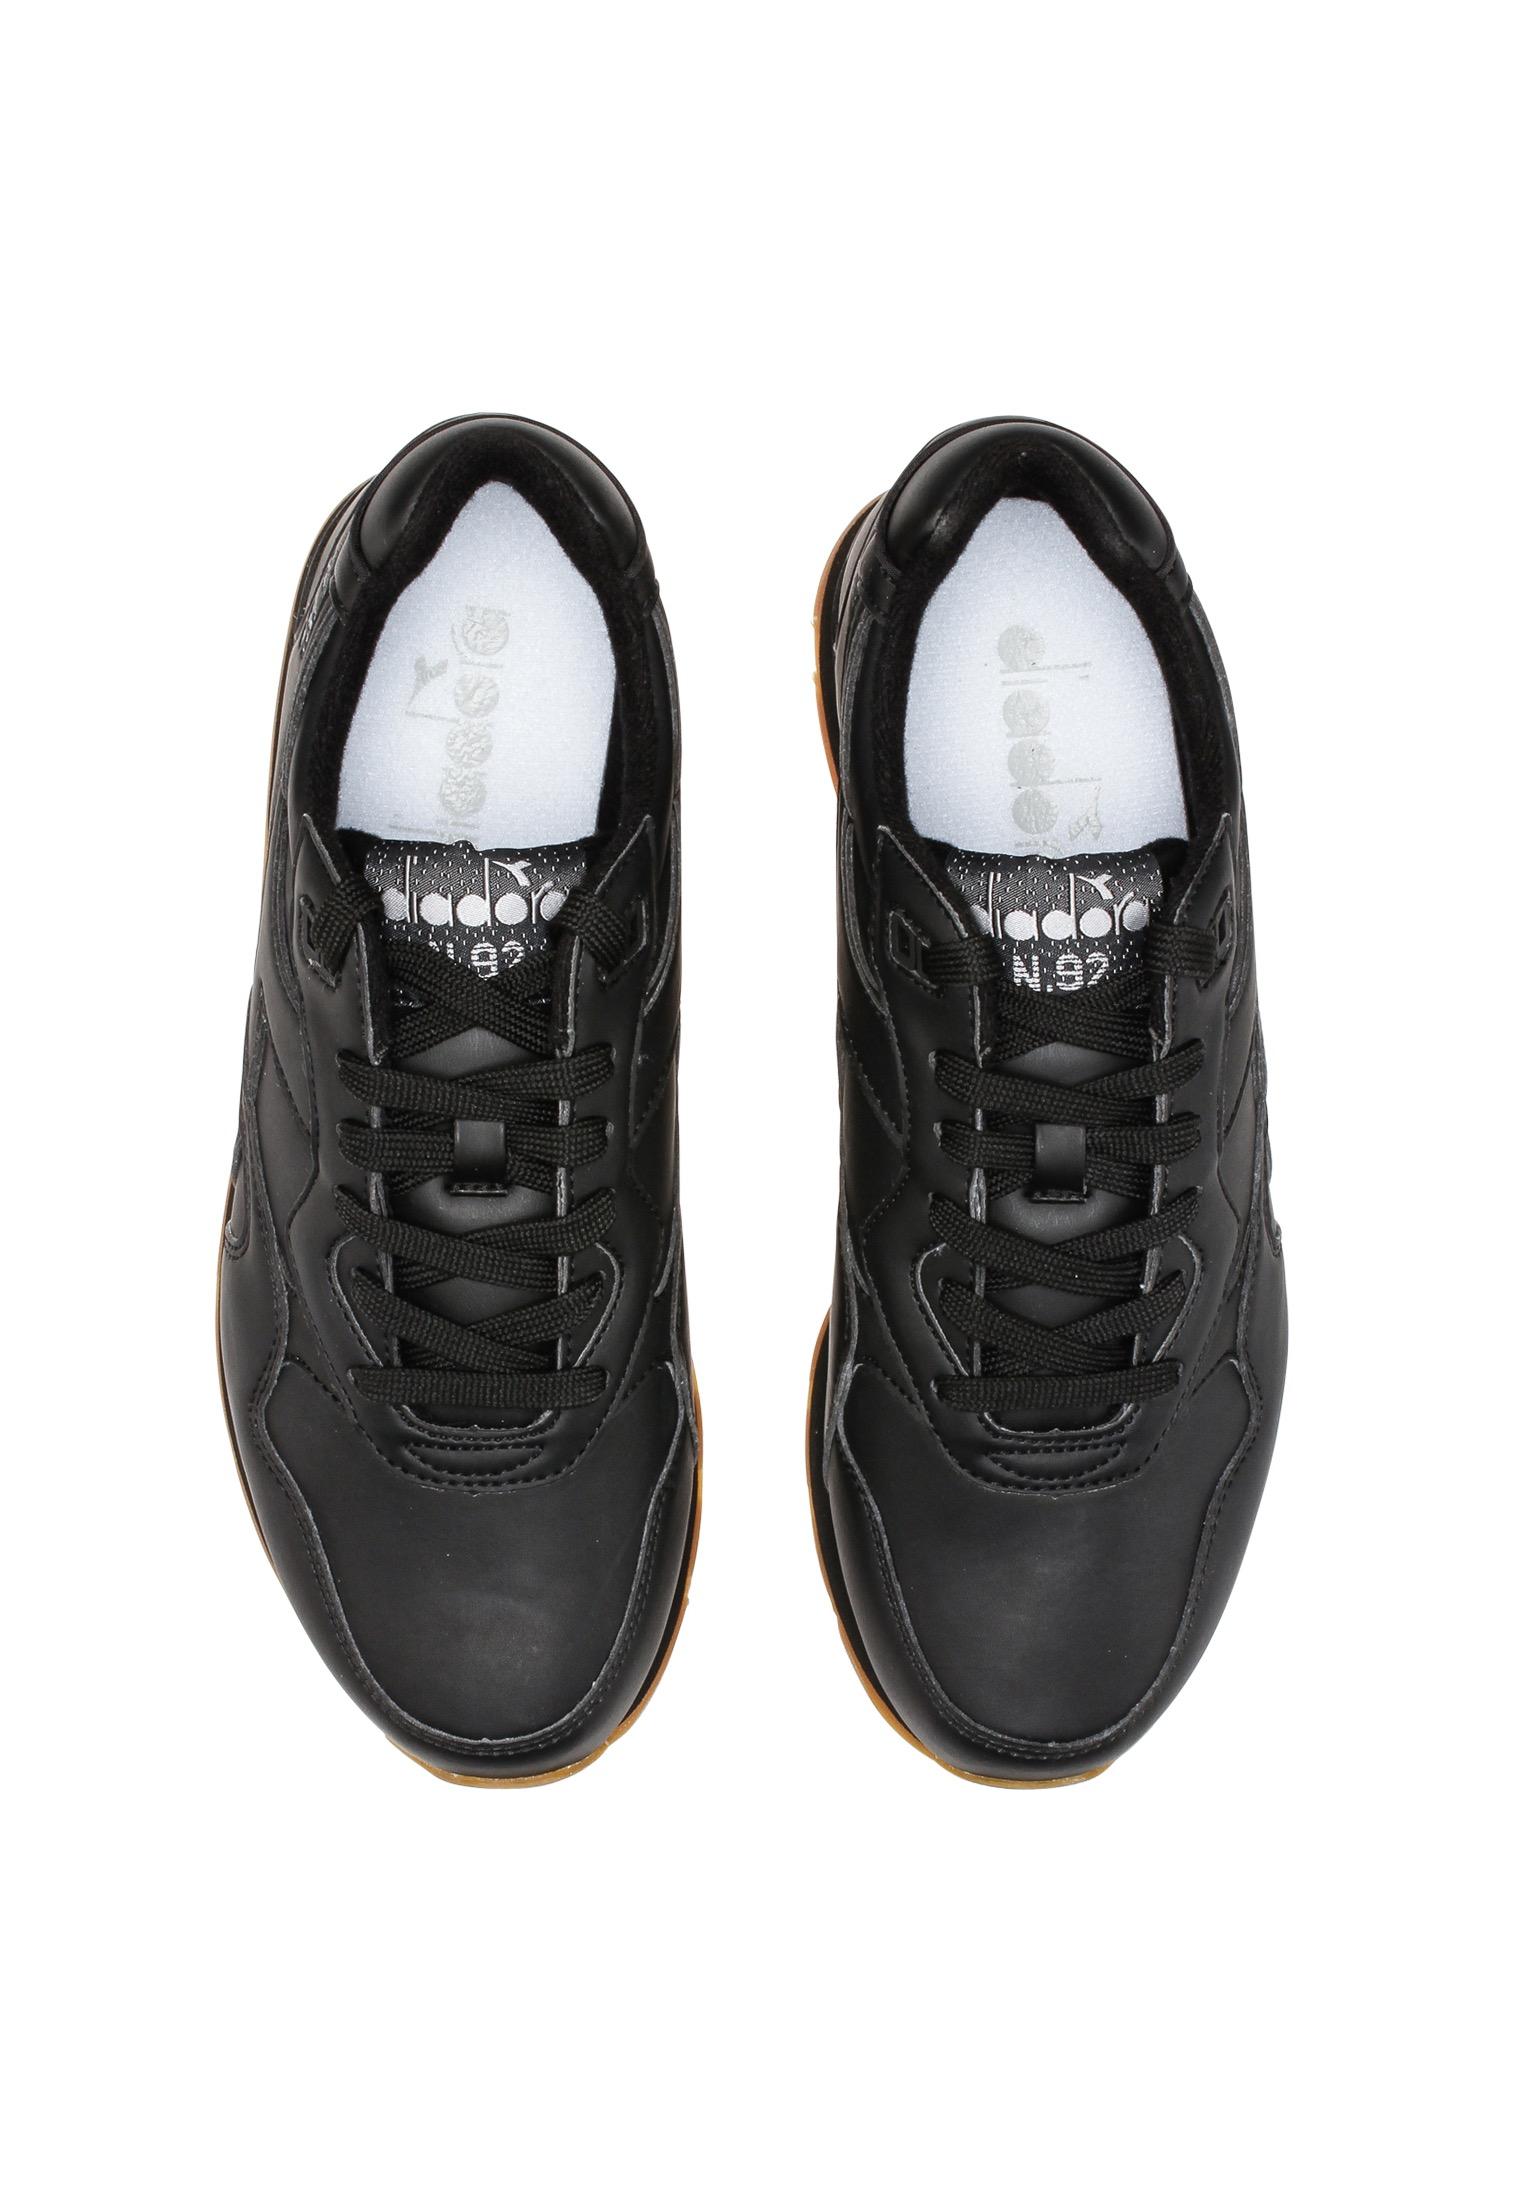 Diadora-Scarpe-Sportive-N-92-L-per-uomo-e-donna miniatura 12